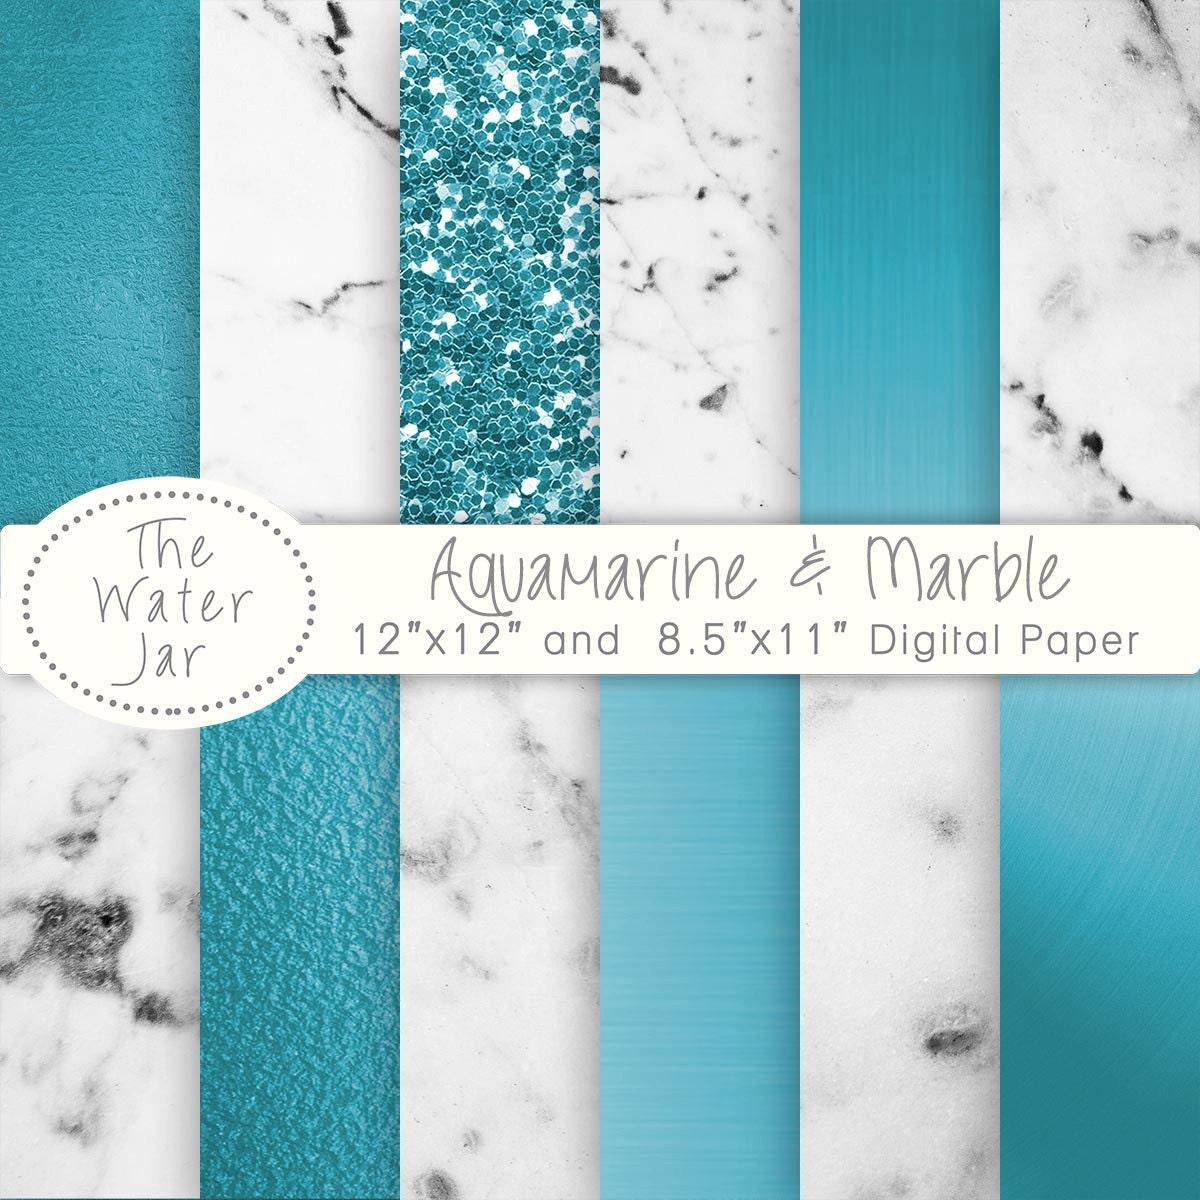 Most Inspiring Wallpaper Marble Aqua - il_fullxfull  Gallery_924751.jpg?version\u003d1